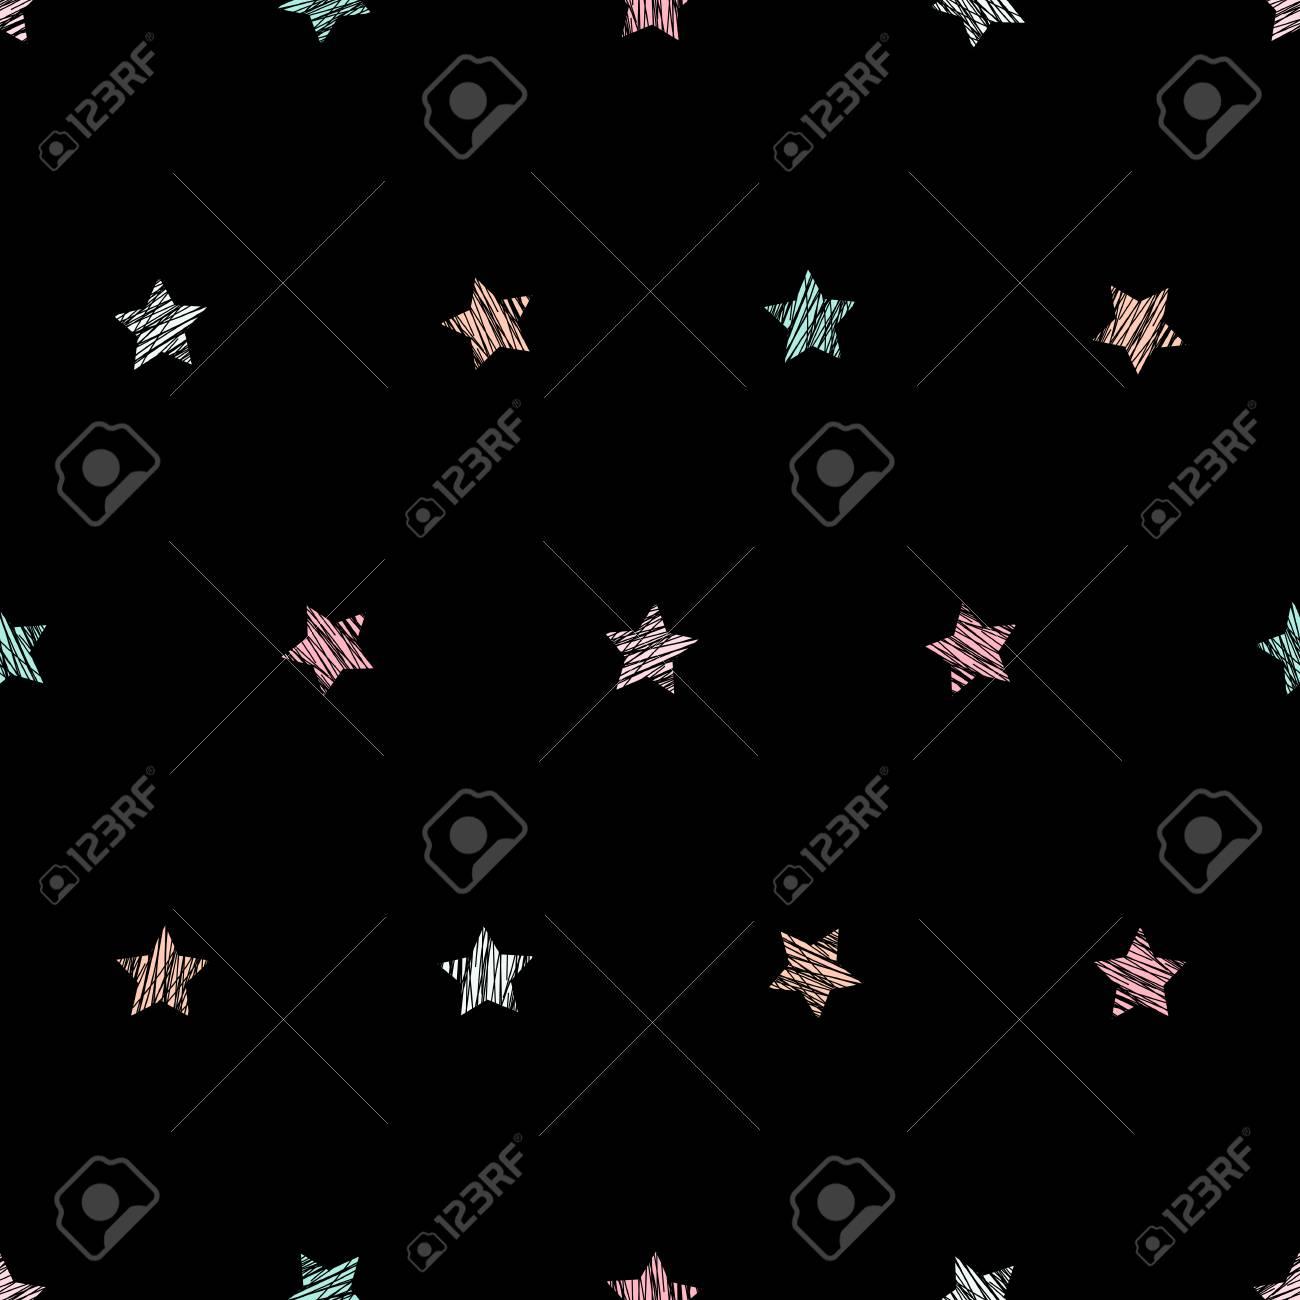 Star Texture Plain Seamless Pattern Black Background Pale